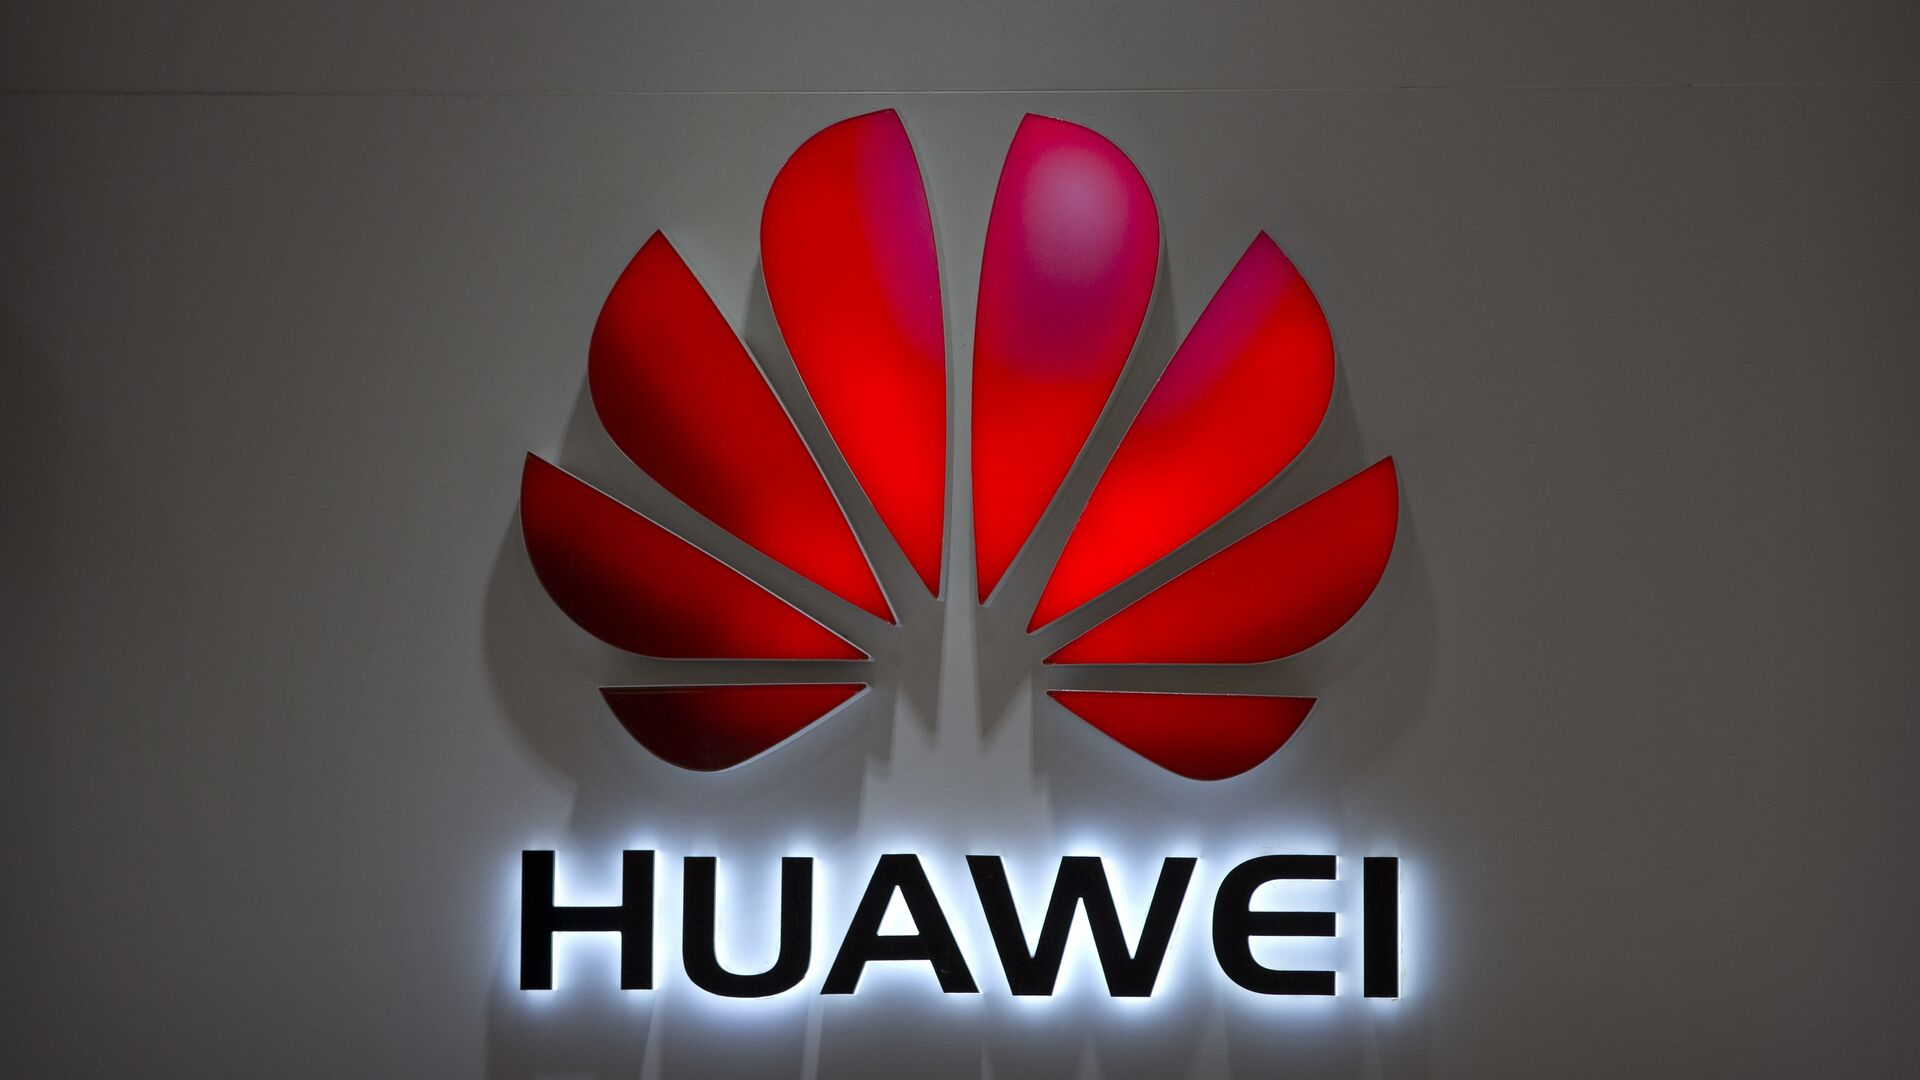 El logo de Huawei  - Sputnik Mundo, 1920, 19.04.2021